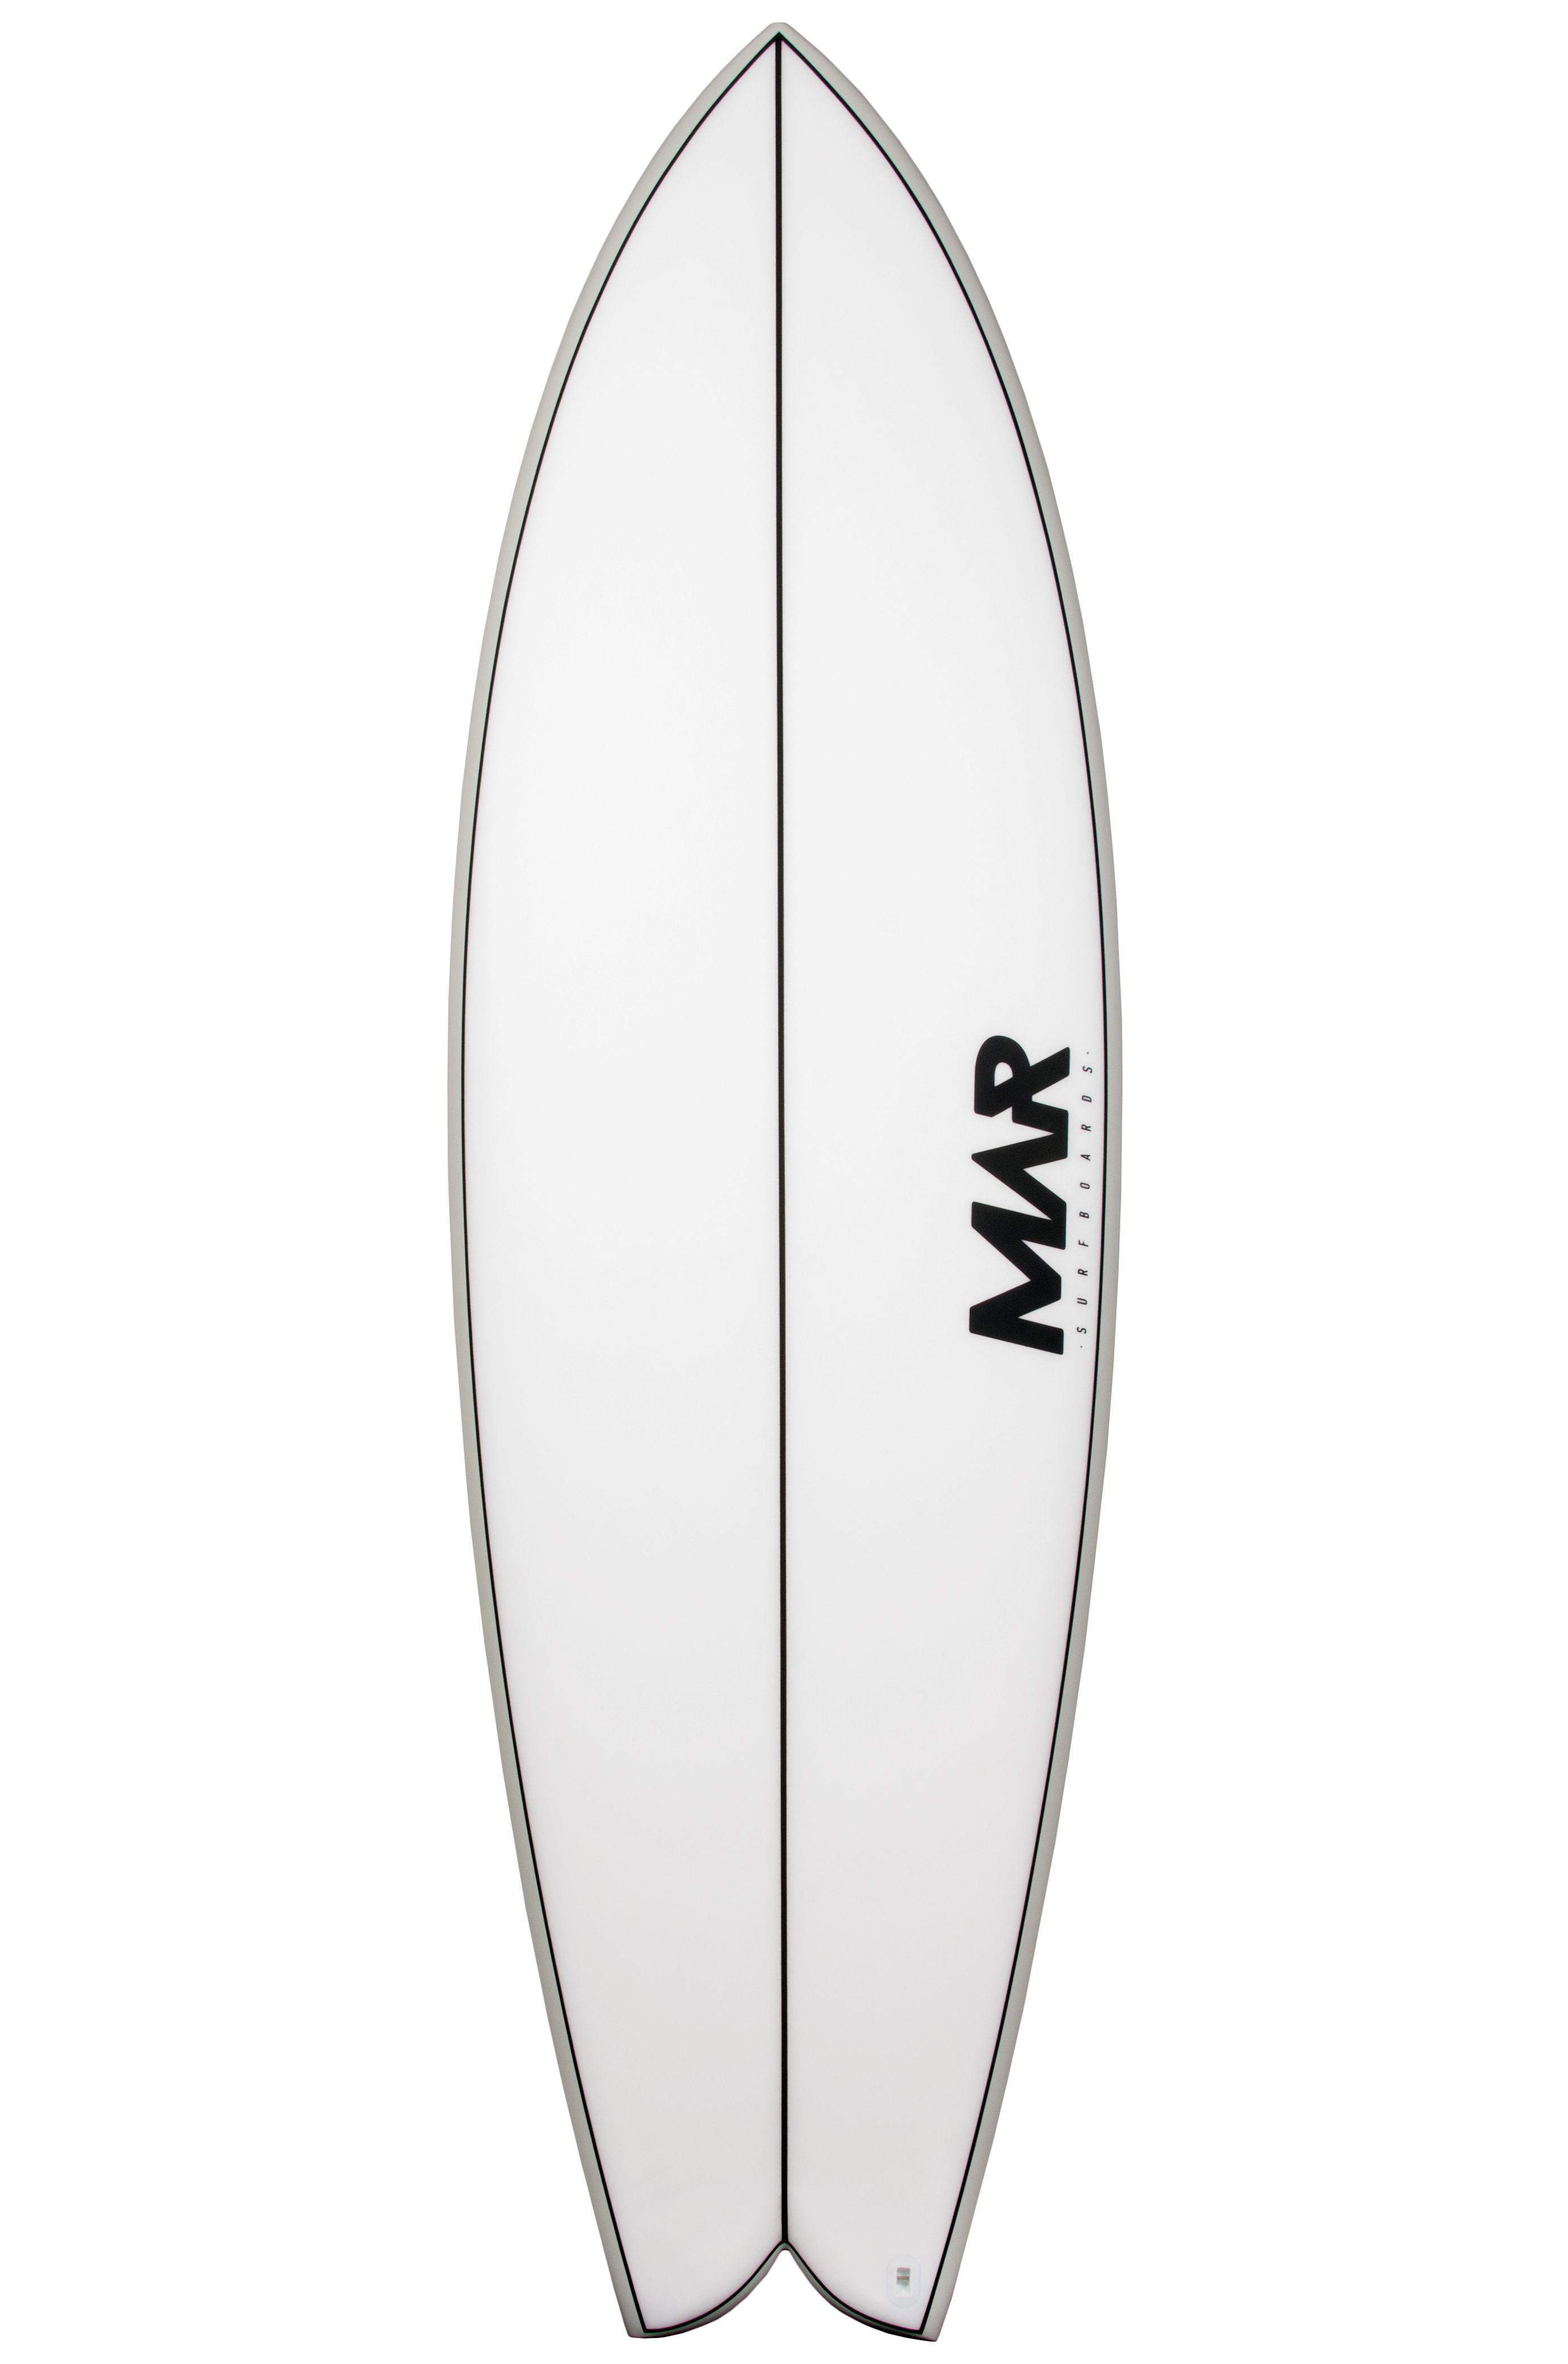 Mar Surf Board 5'4 MAR P2 XE Fish Tail - White FCS II Twin Tab 5ft4